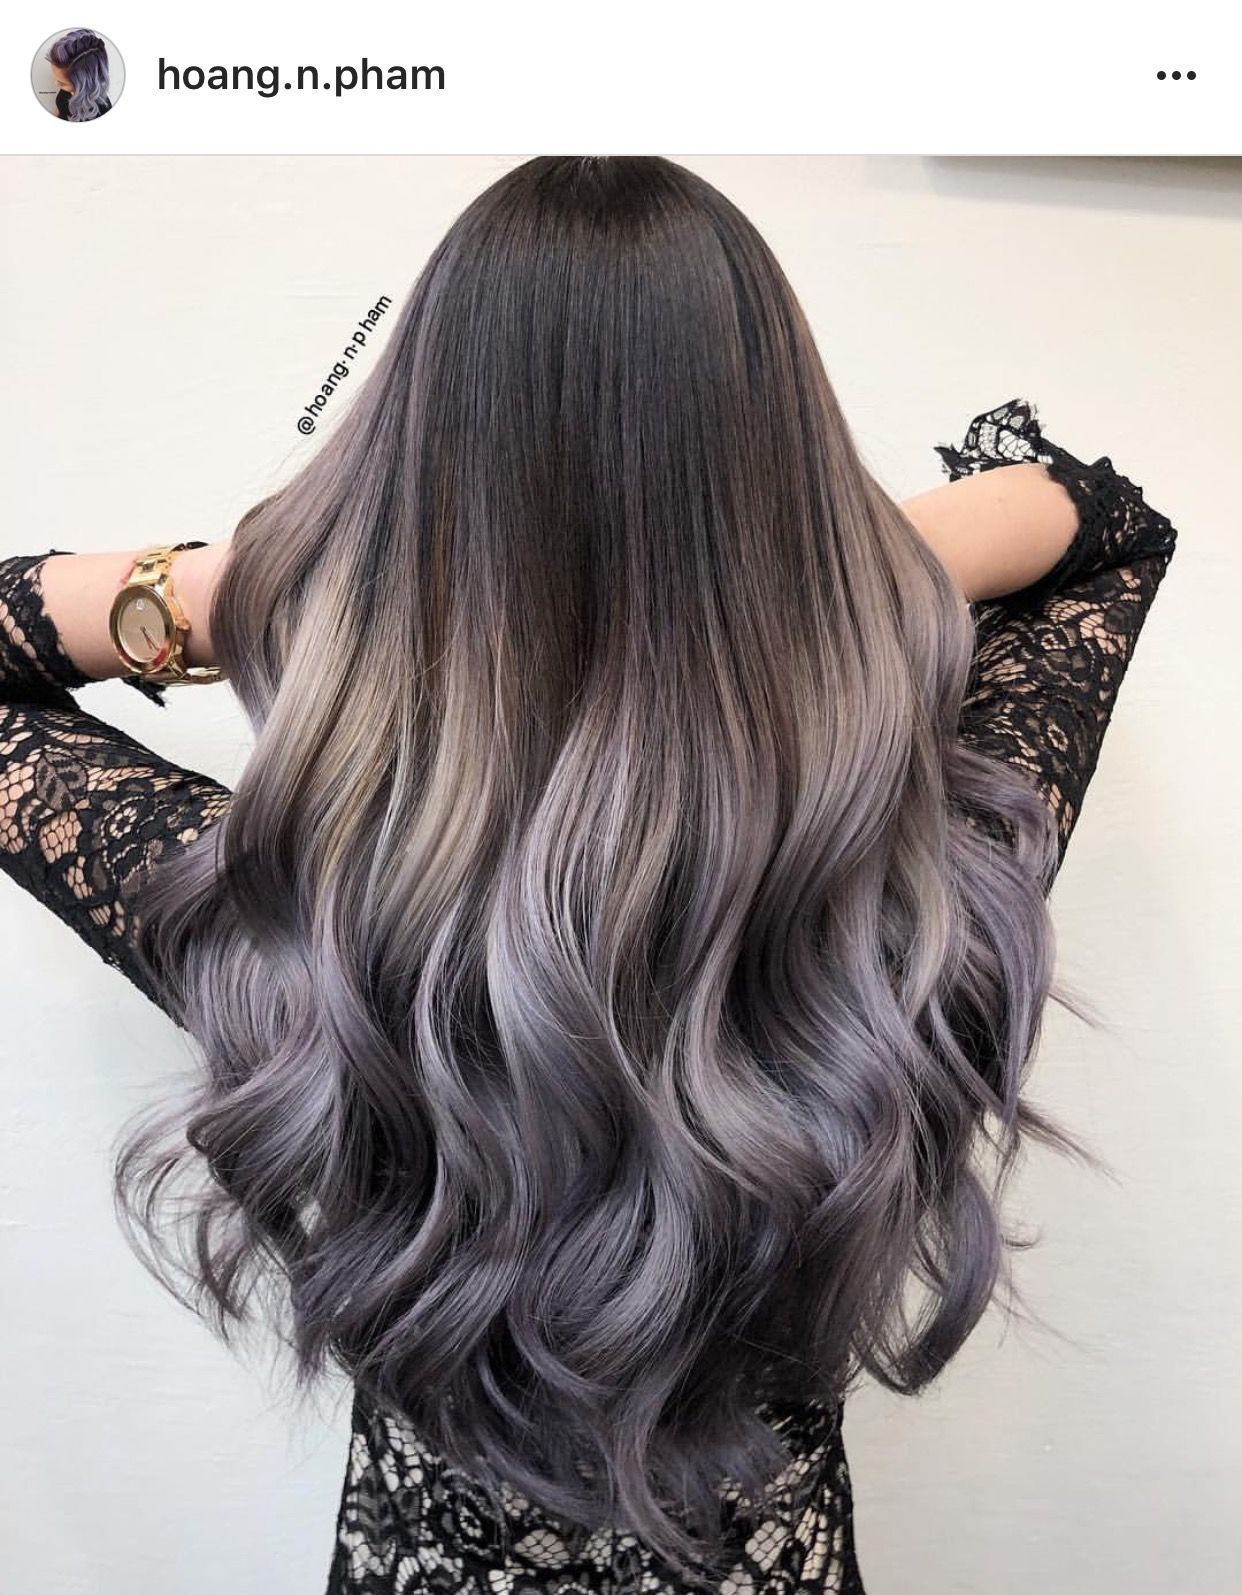 Hair Haircolor Hairideas Hairinspiration Hairstyle With Images Hair Styles Hair Color For Morena Skin Hair Color For Morena